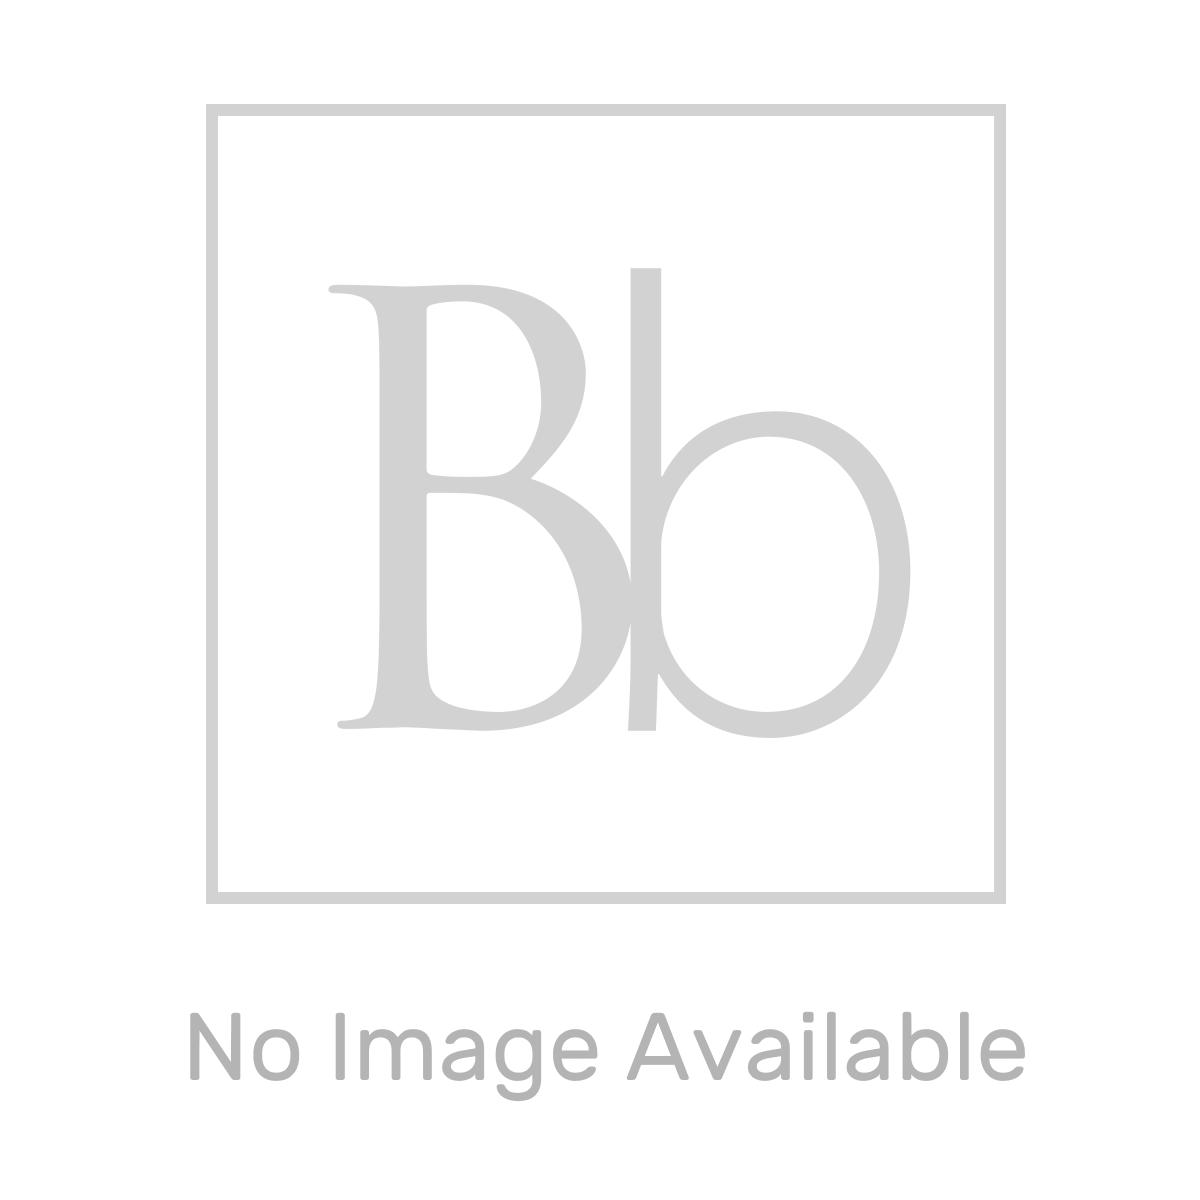 RAK Ecofix Regular Concealed Cistern 410 x 735mm Dimensions